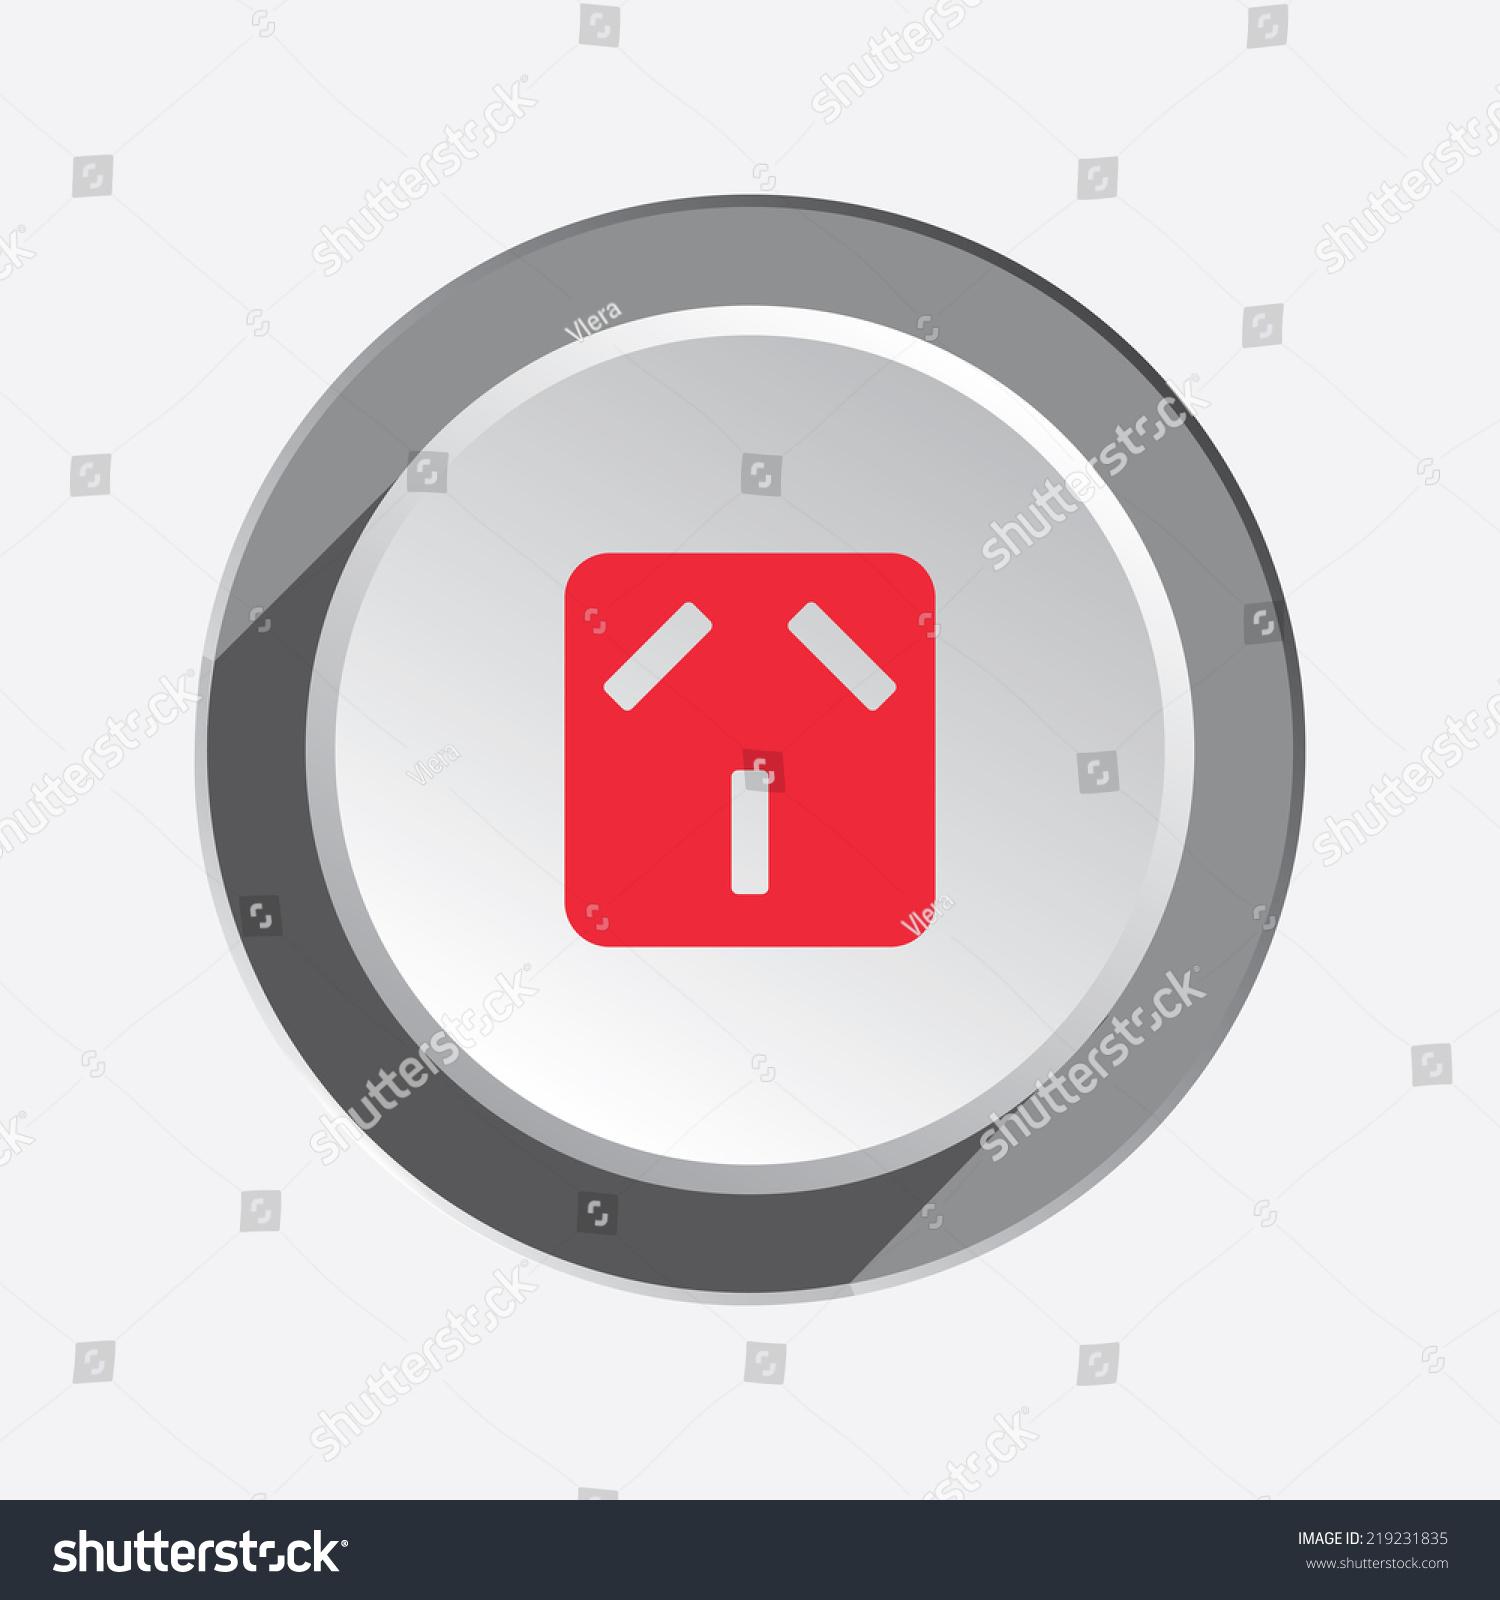 Plug Power Stock Quote: Electric Plug Socket Base Icon Australian Stock Vector